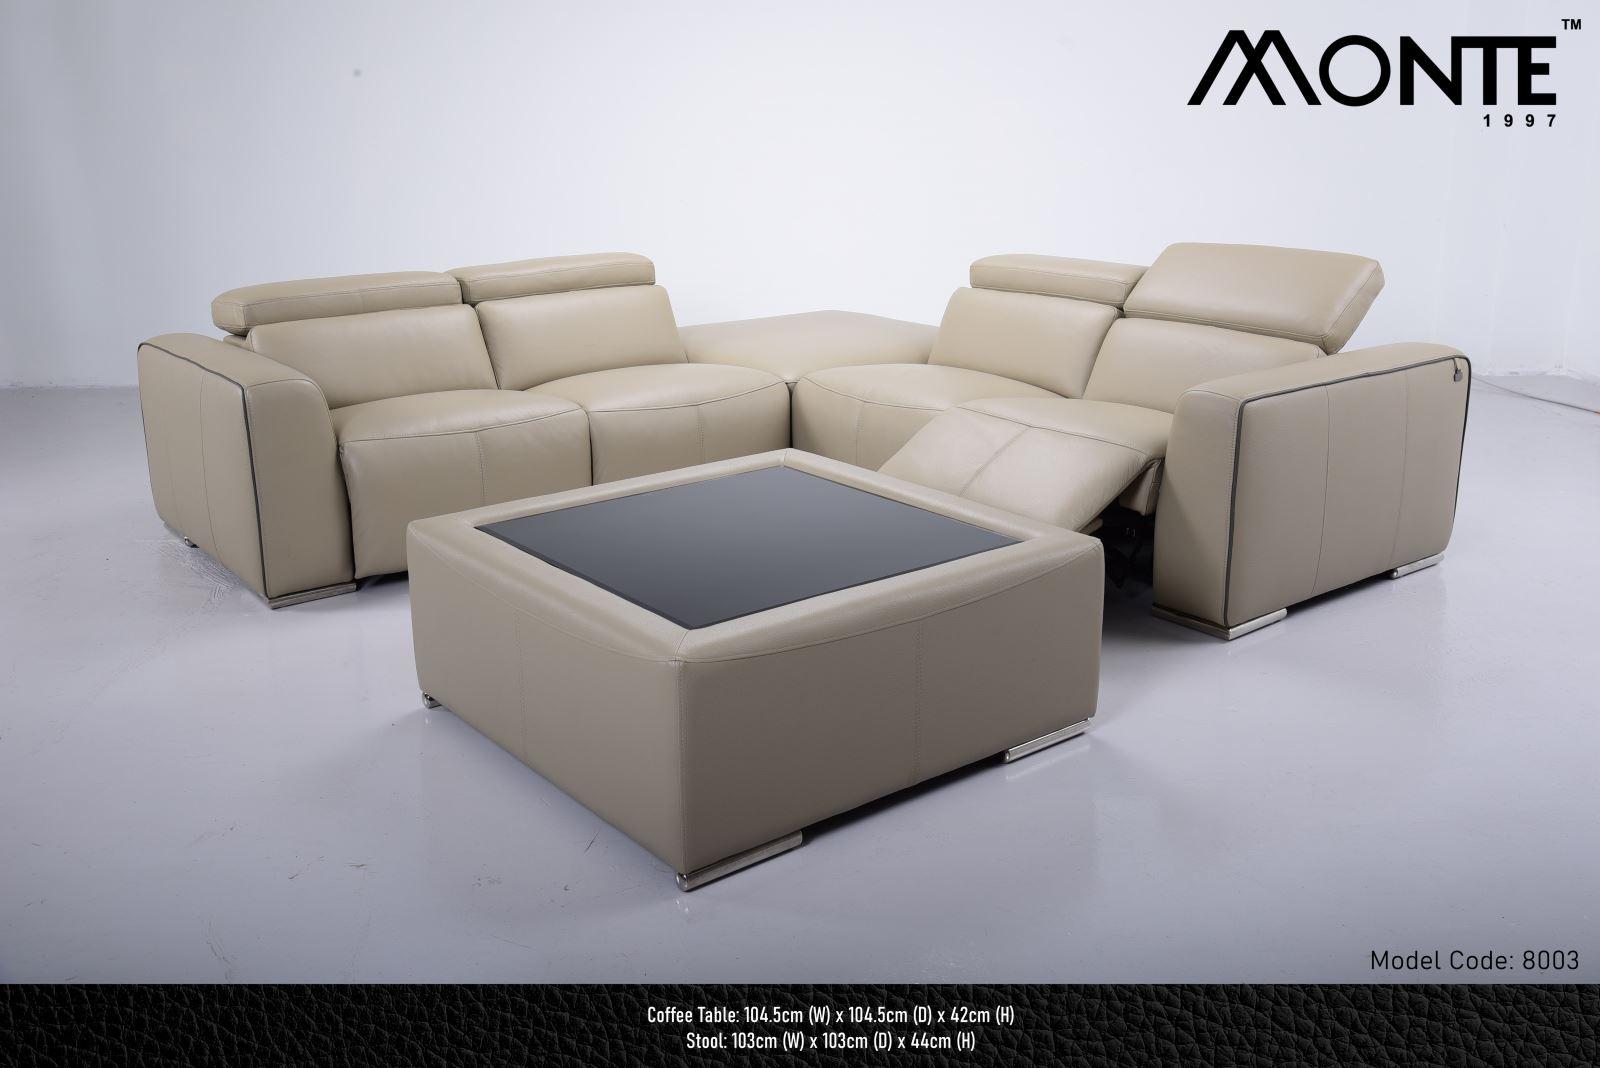 SOFA DA BÒ - MONTE MODEL 8003 (1+2+3)